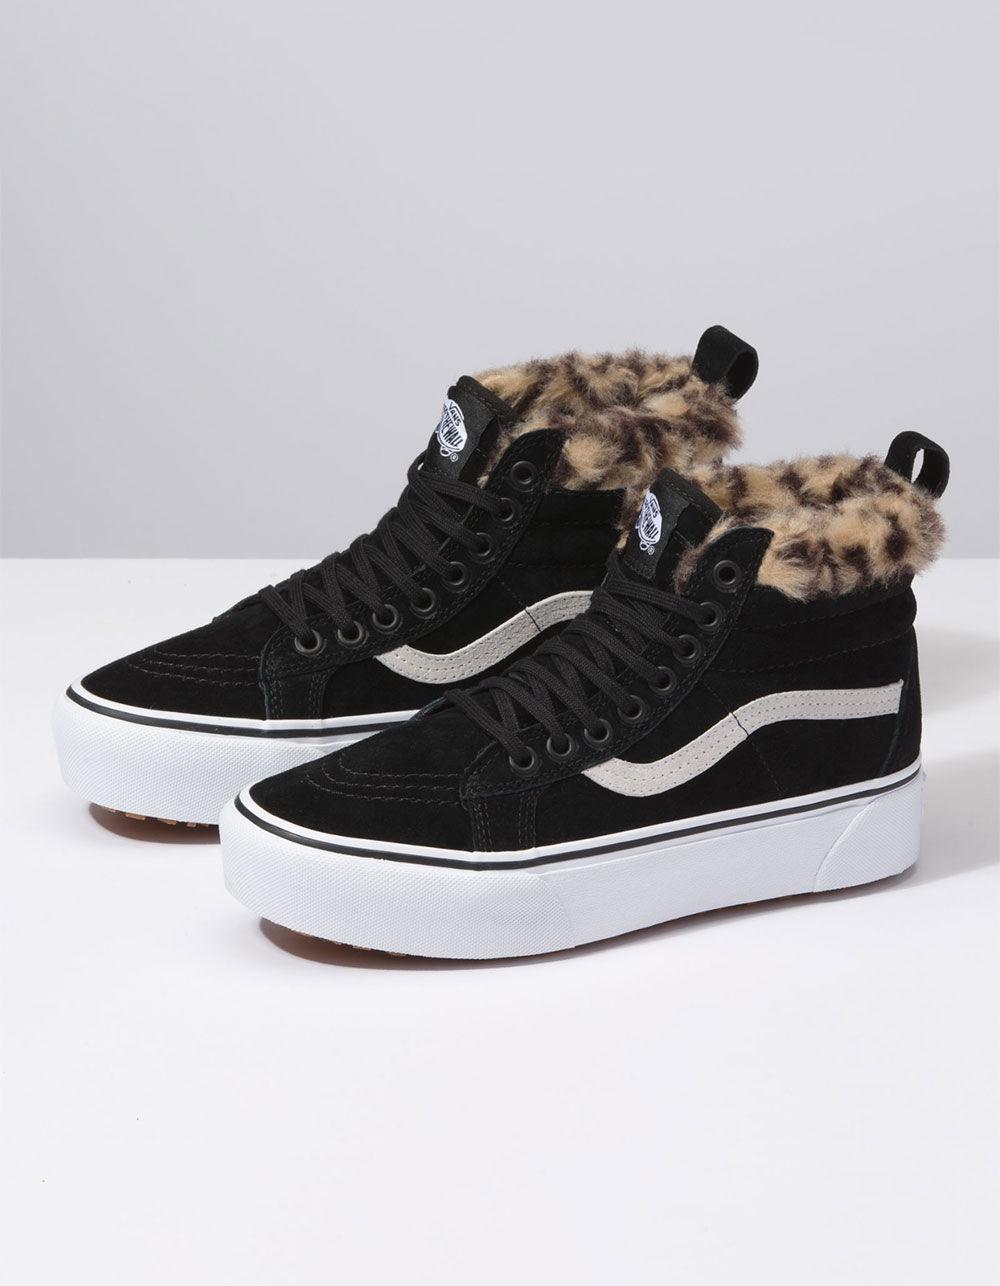 b60e9adf5d7 Lyst - Vans Sk8-hi Platform Mte Black   Leopard Fur Womens Shoes in Black -  Save 19%